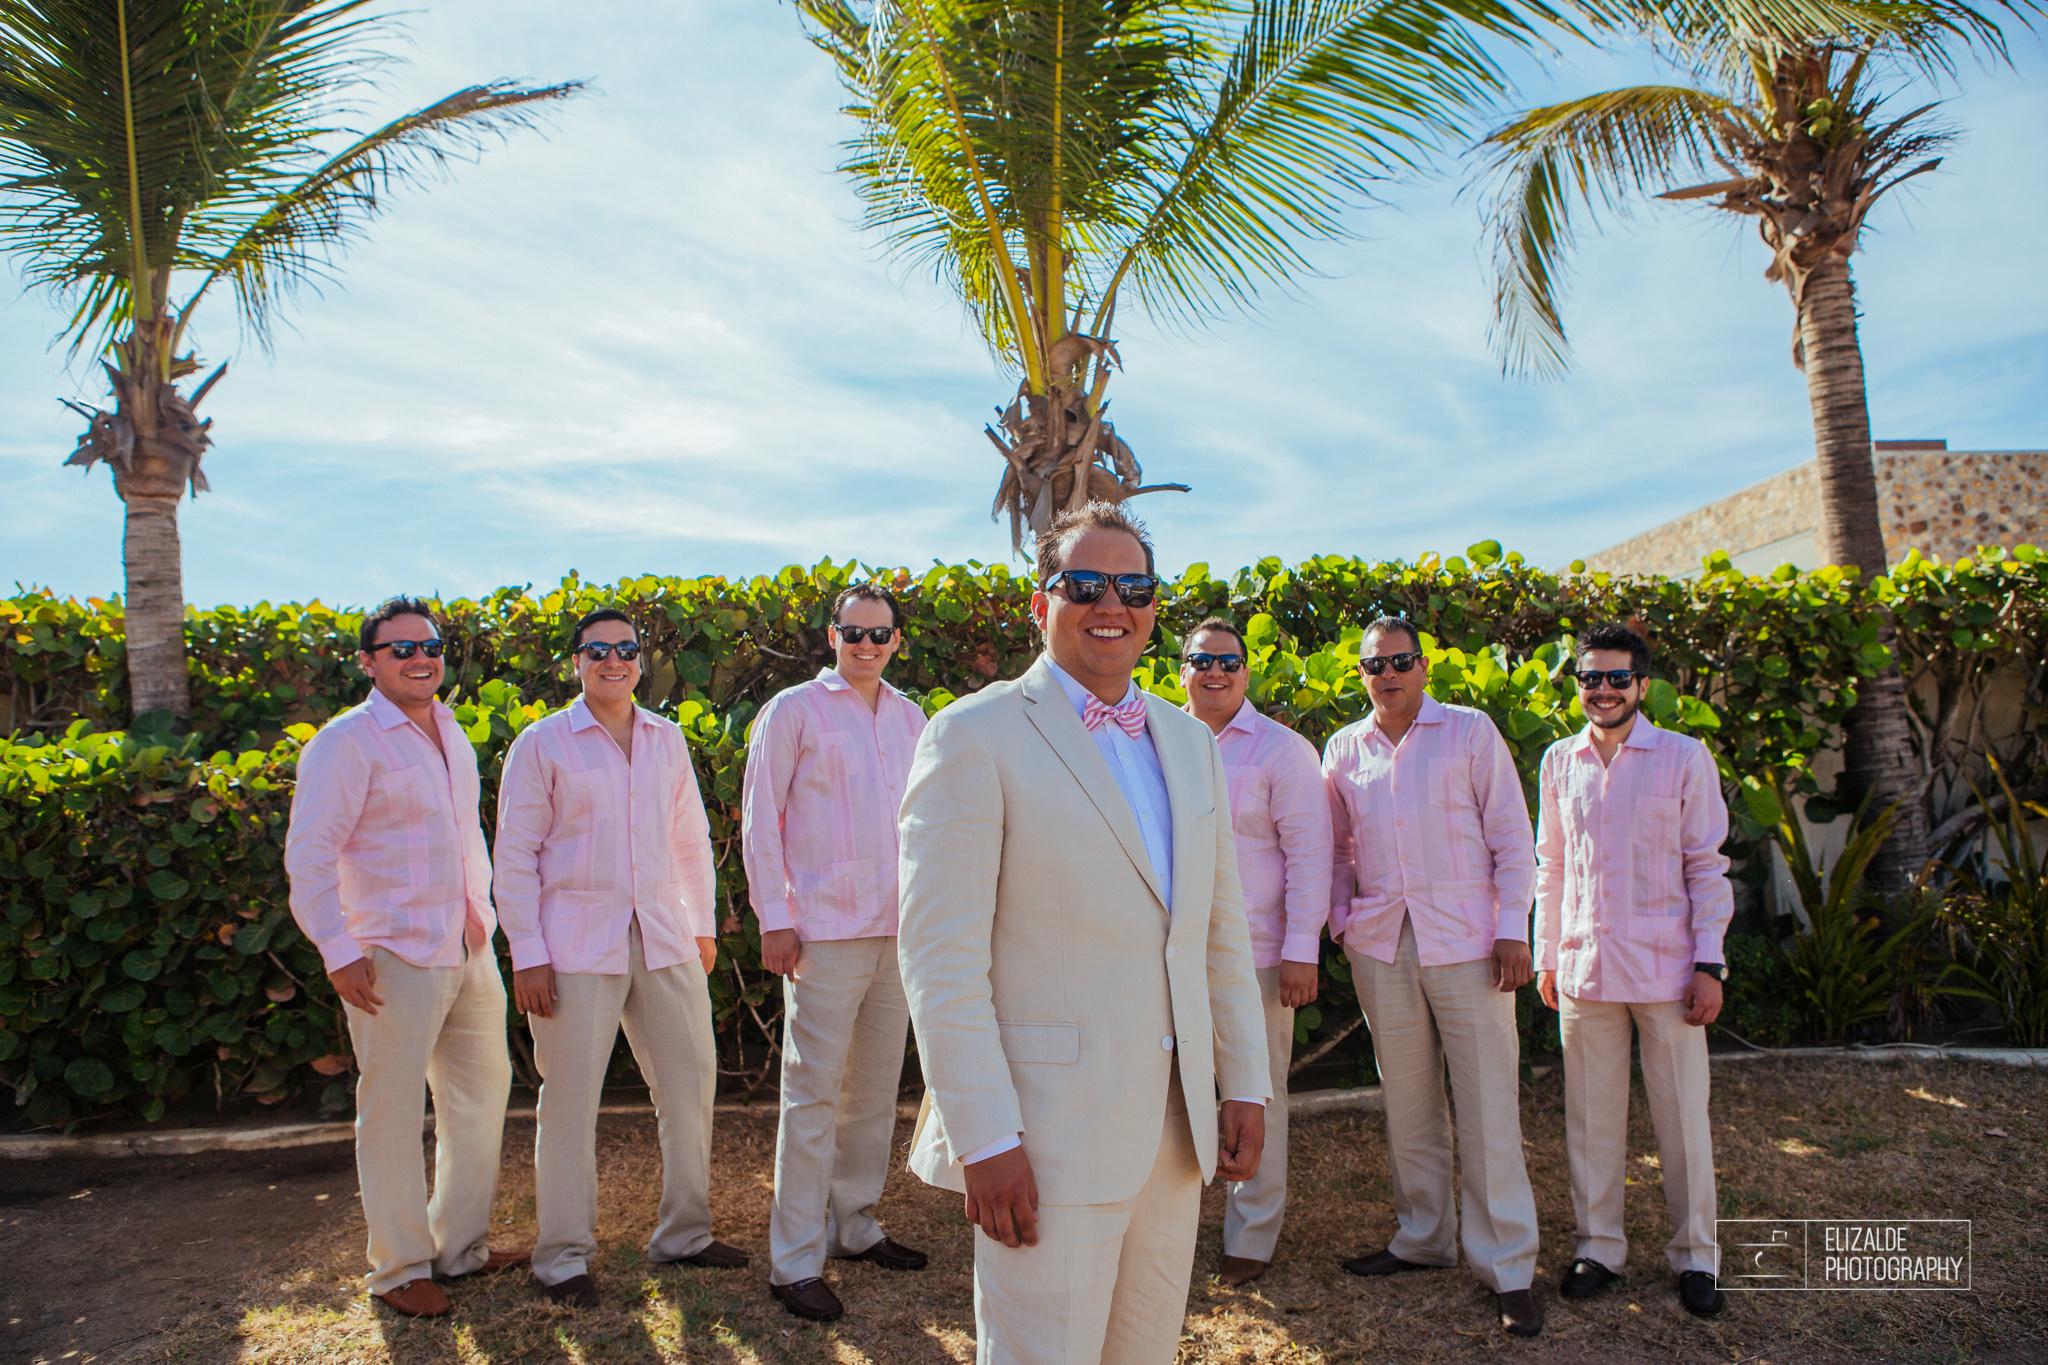 Pay and Ferran_Acapulco_Destination Wedding_Elizalde Photography-38.jpg